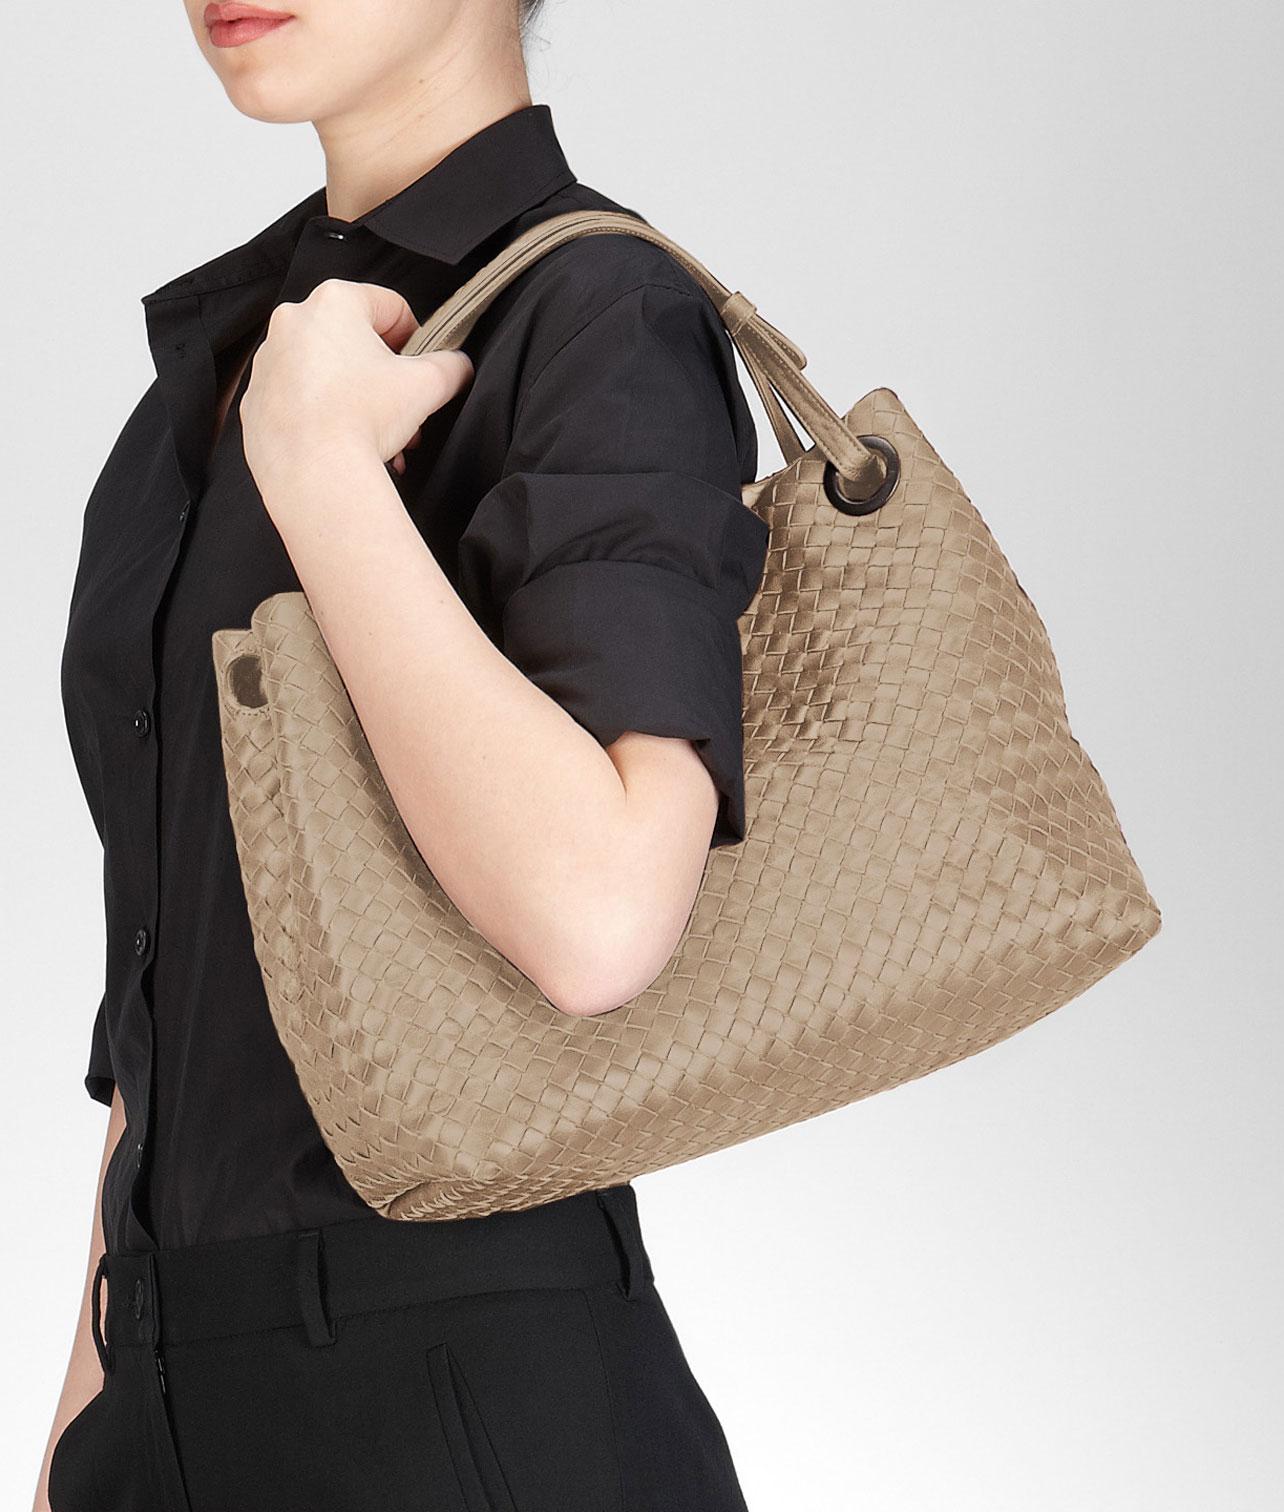 bottega veneta handbags on sale - Bottega veneta Walnut Intrecciato Nappa  Bag in Natural (WALNUT ddbfe0387cc8f